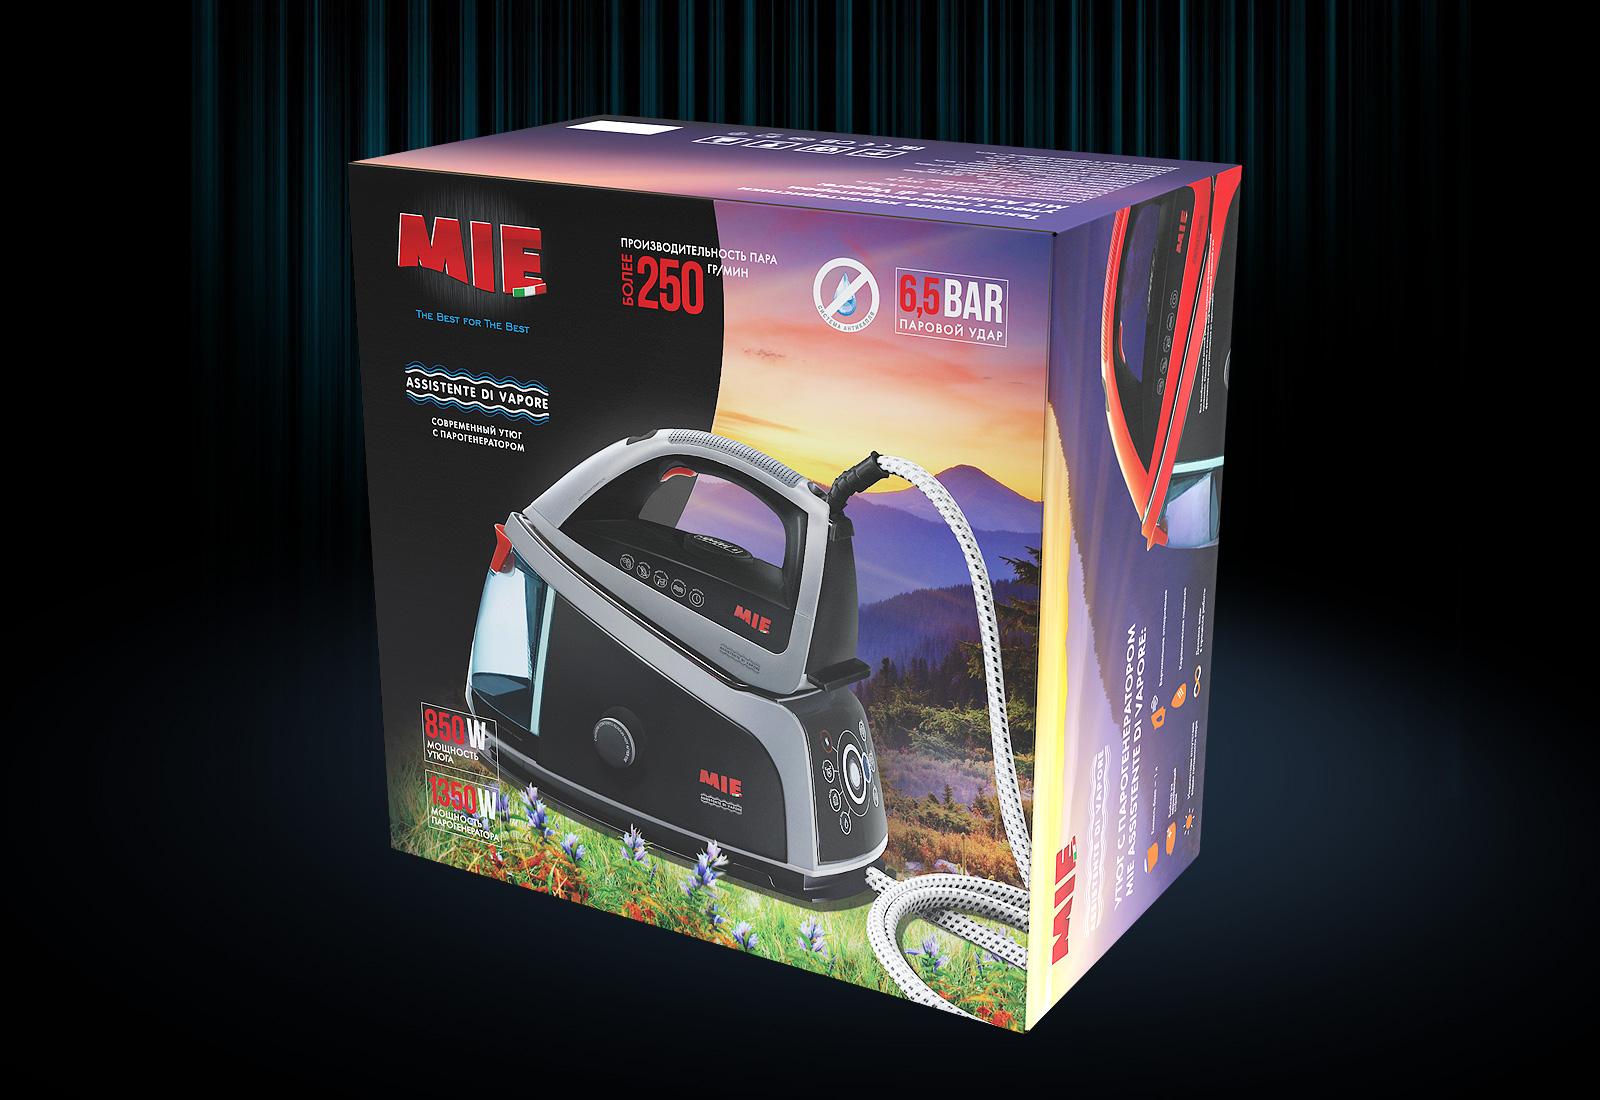 Коробка для техники MIE Assitente di vapore